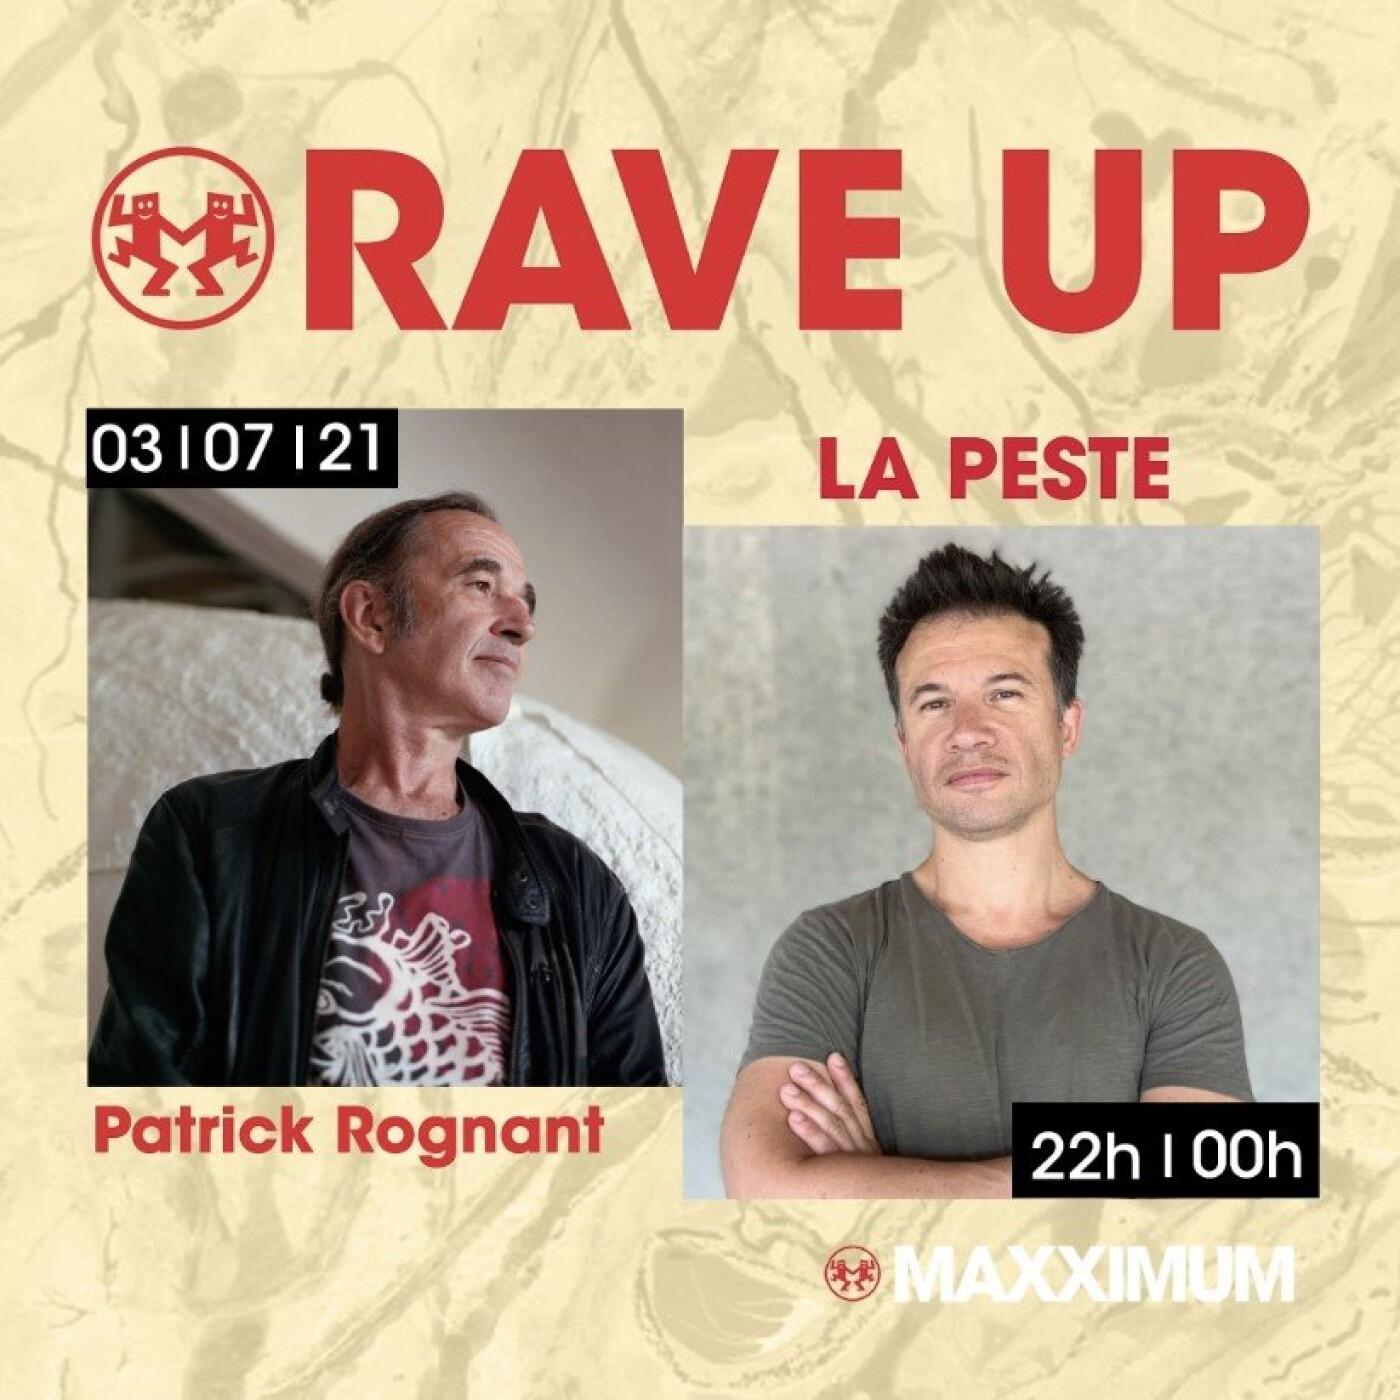 RAVE UP : LA PESTE